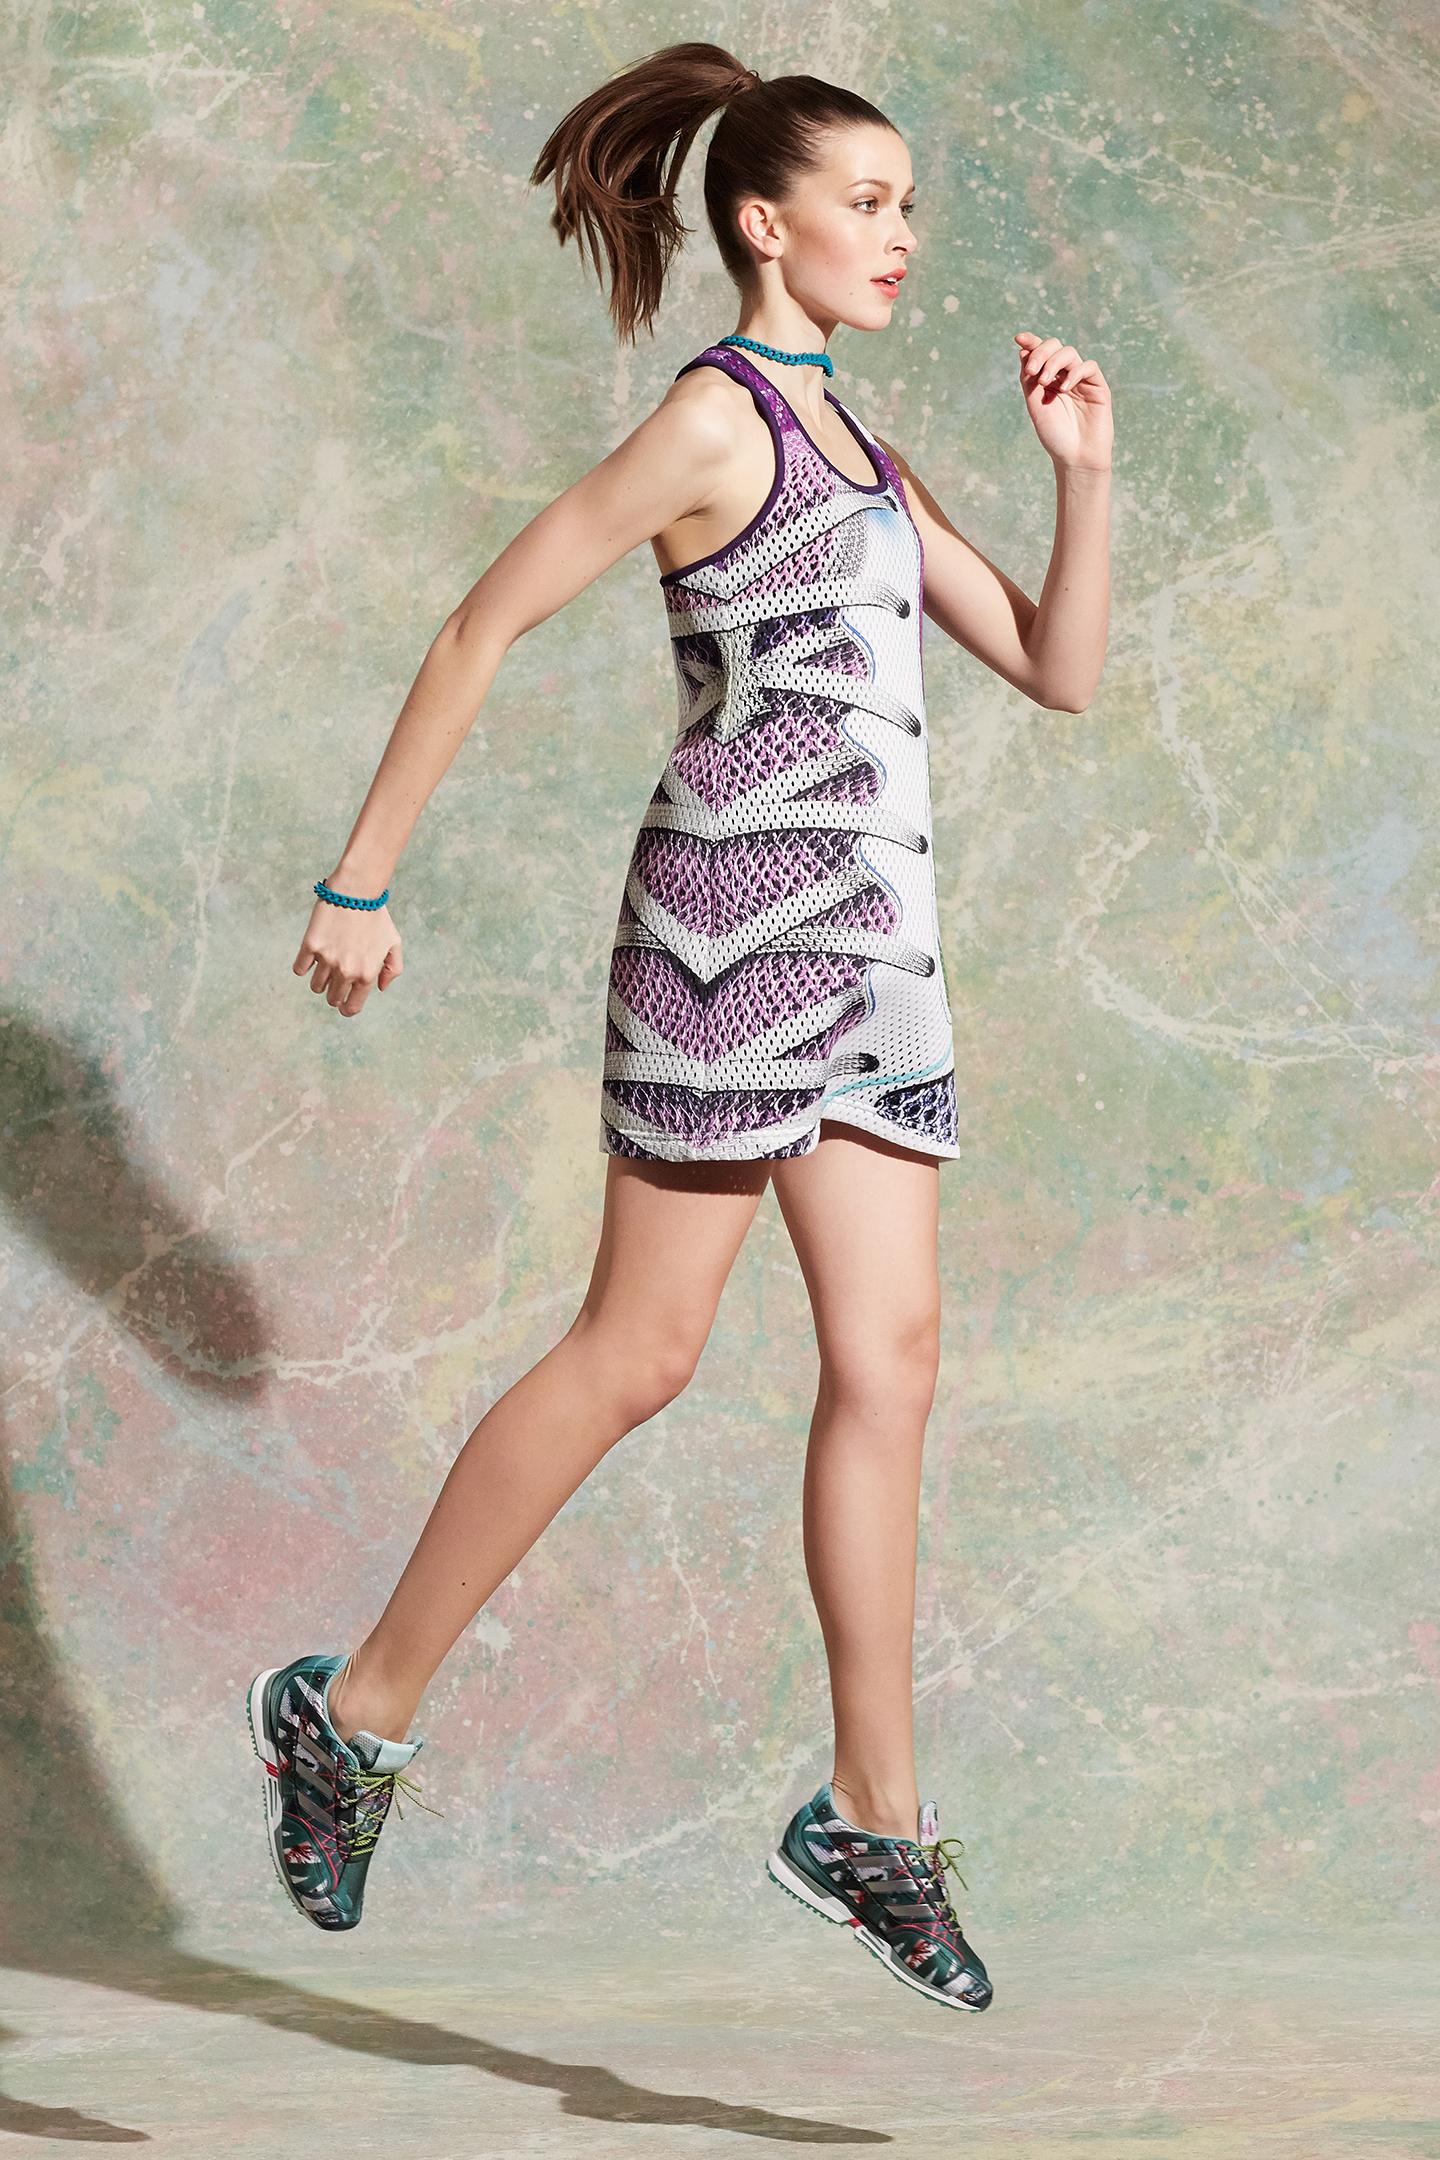 Mary K x Adidas1.jpg